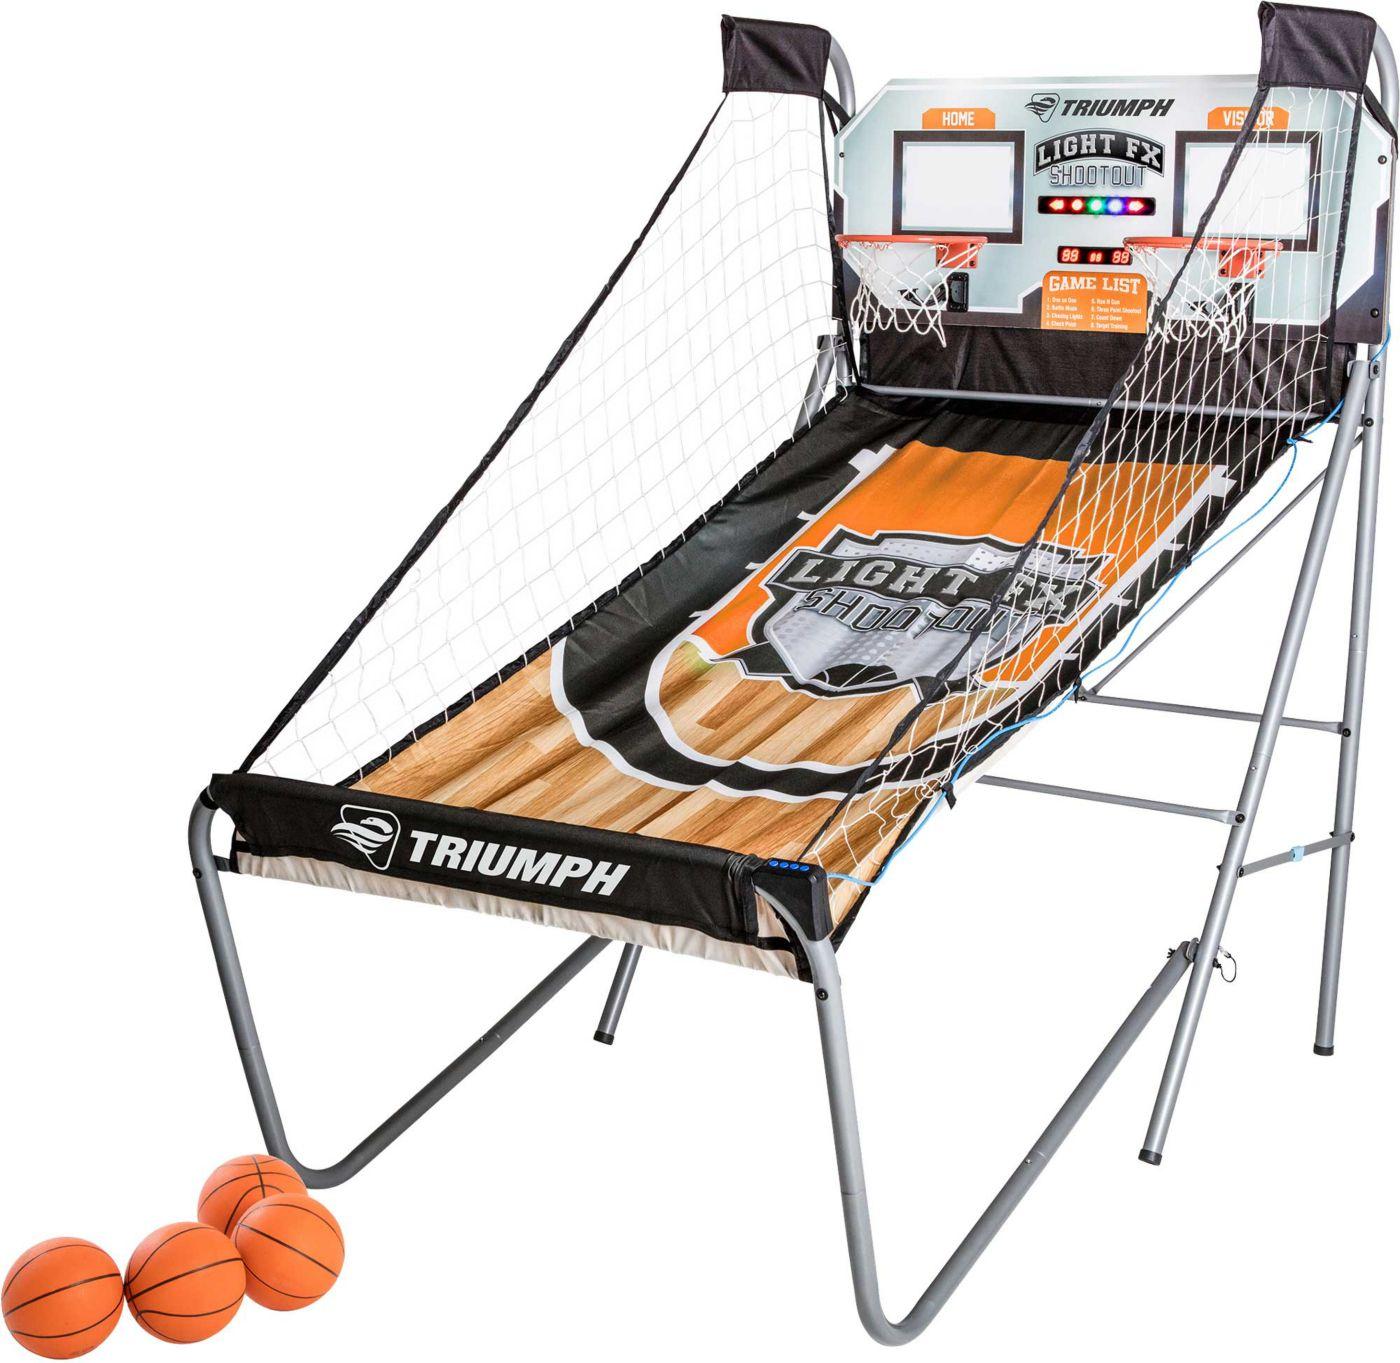 Triumph Light FX Double Shootout Arcade Basketball